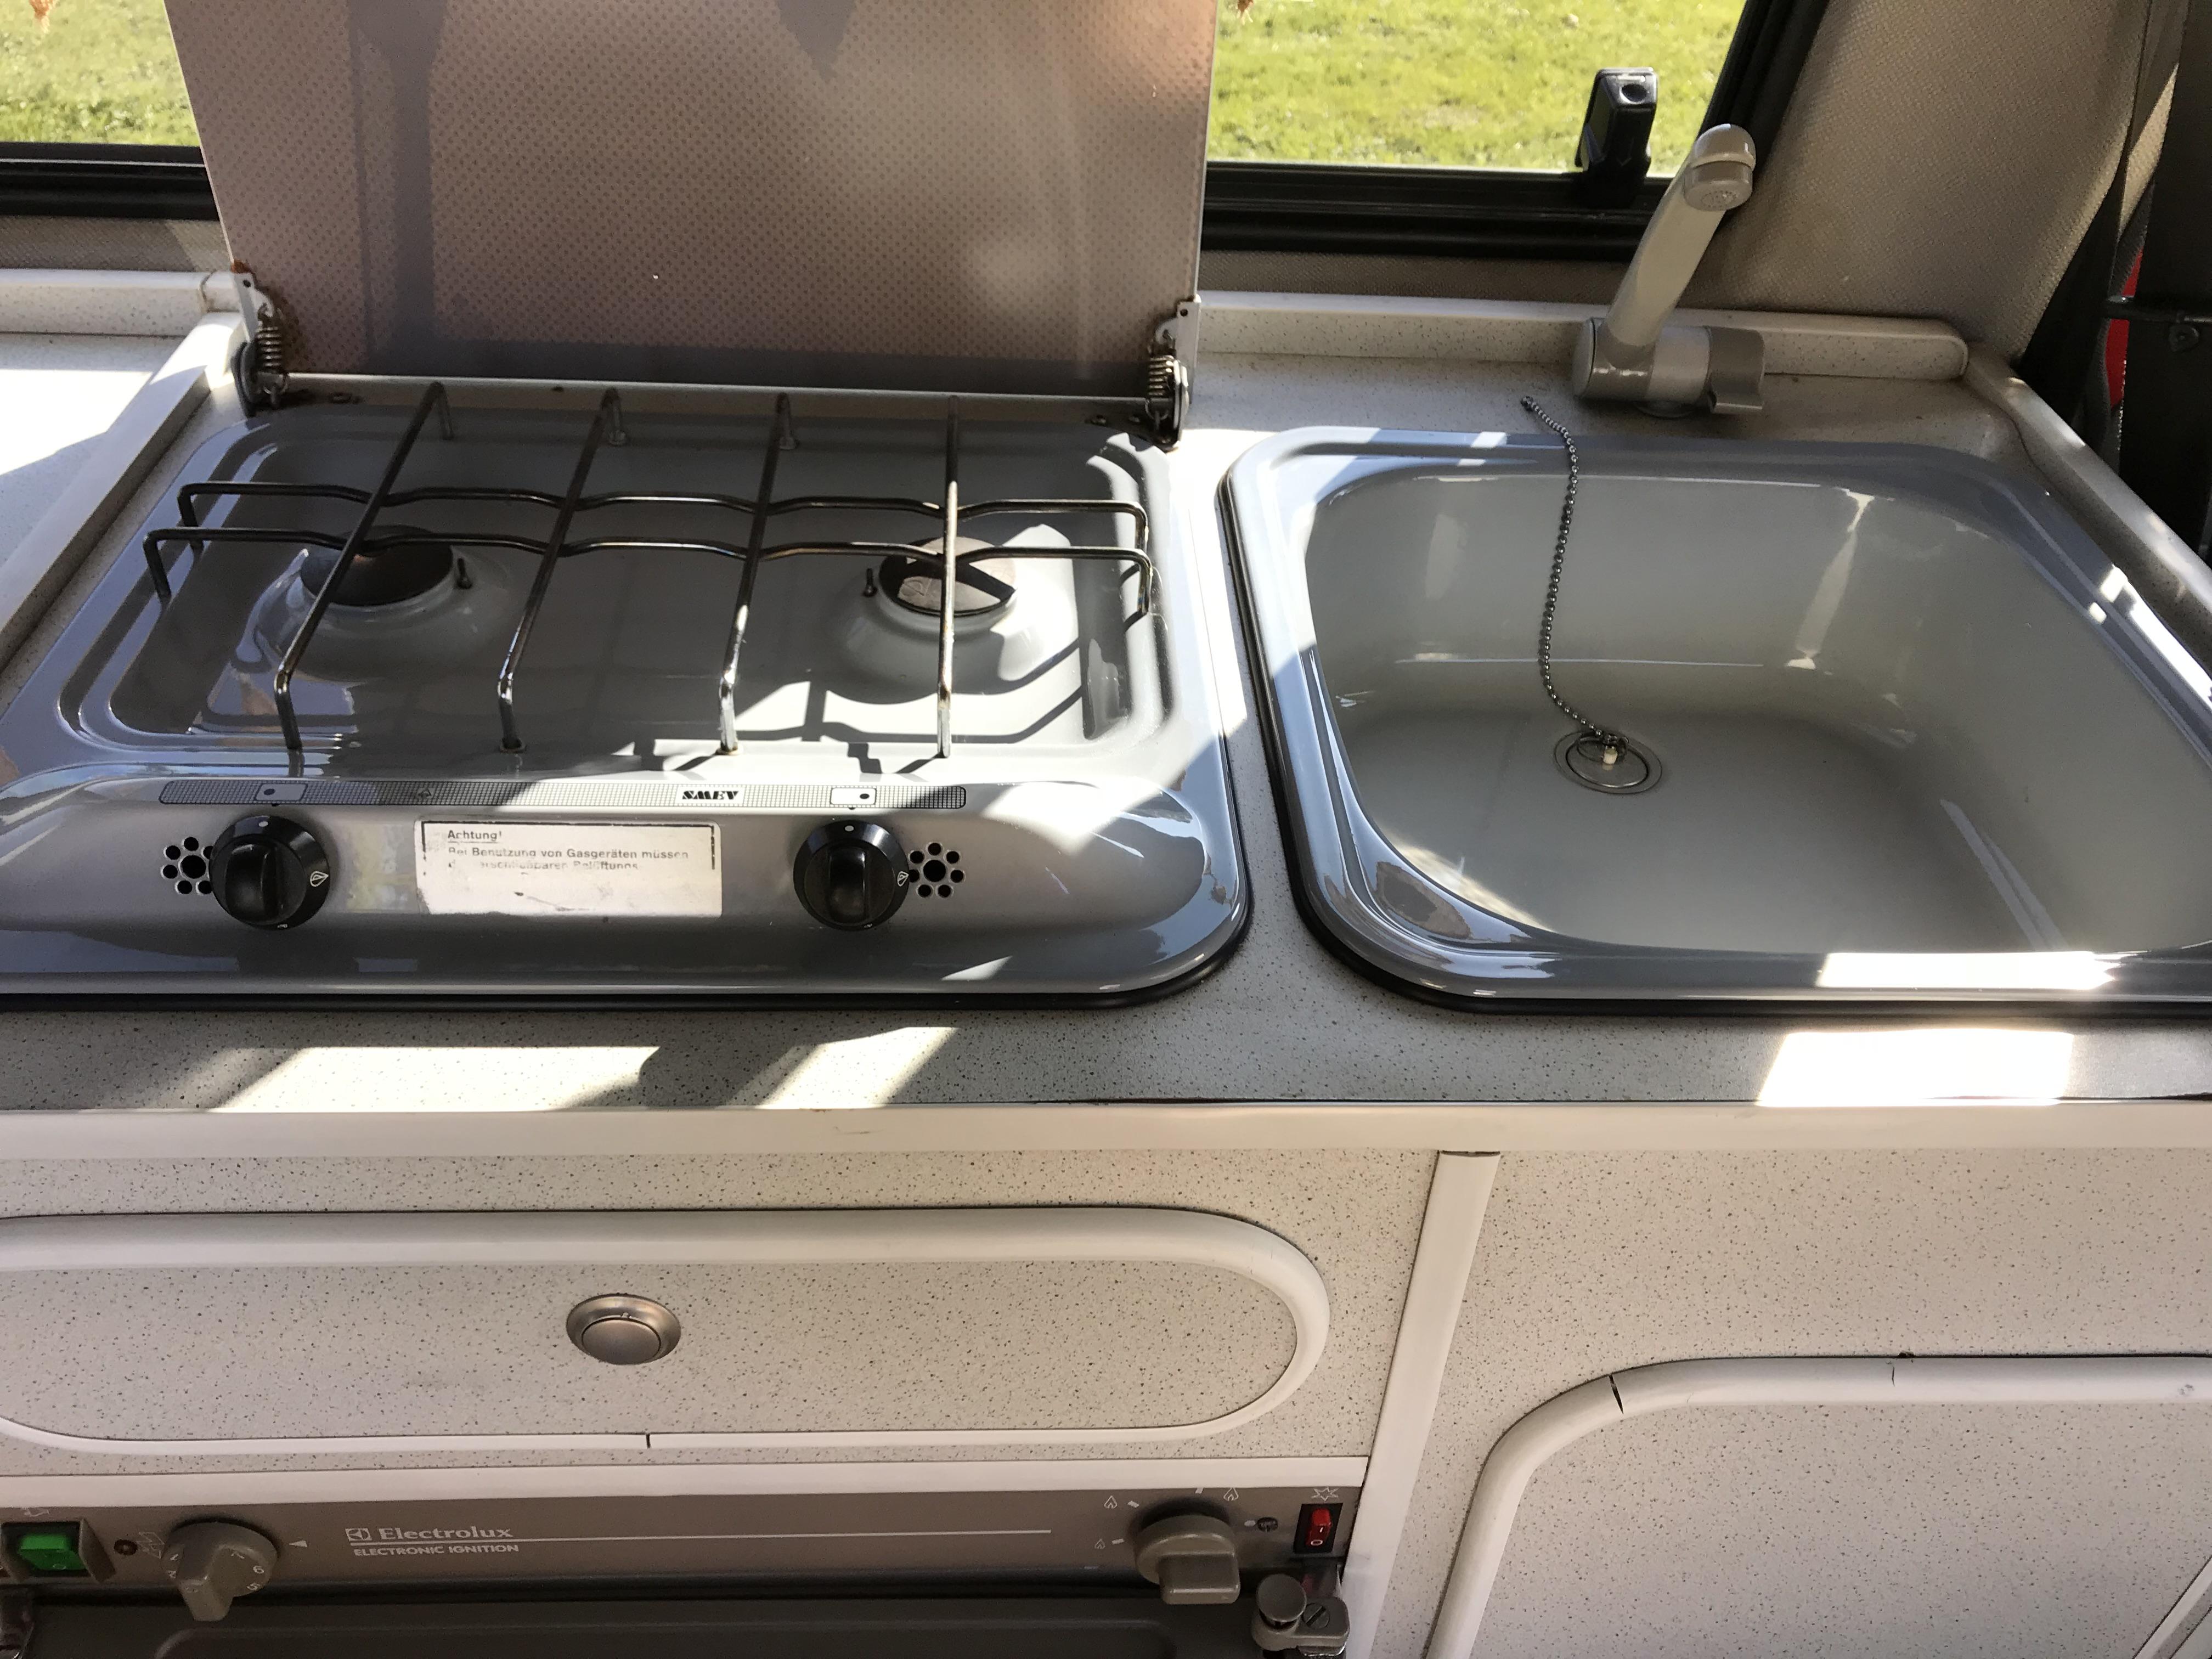 mint-condition-t25-camper-van